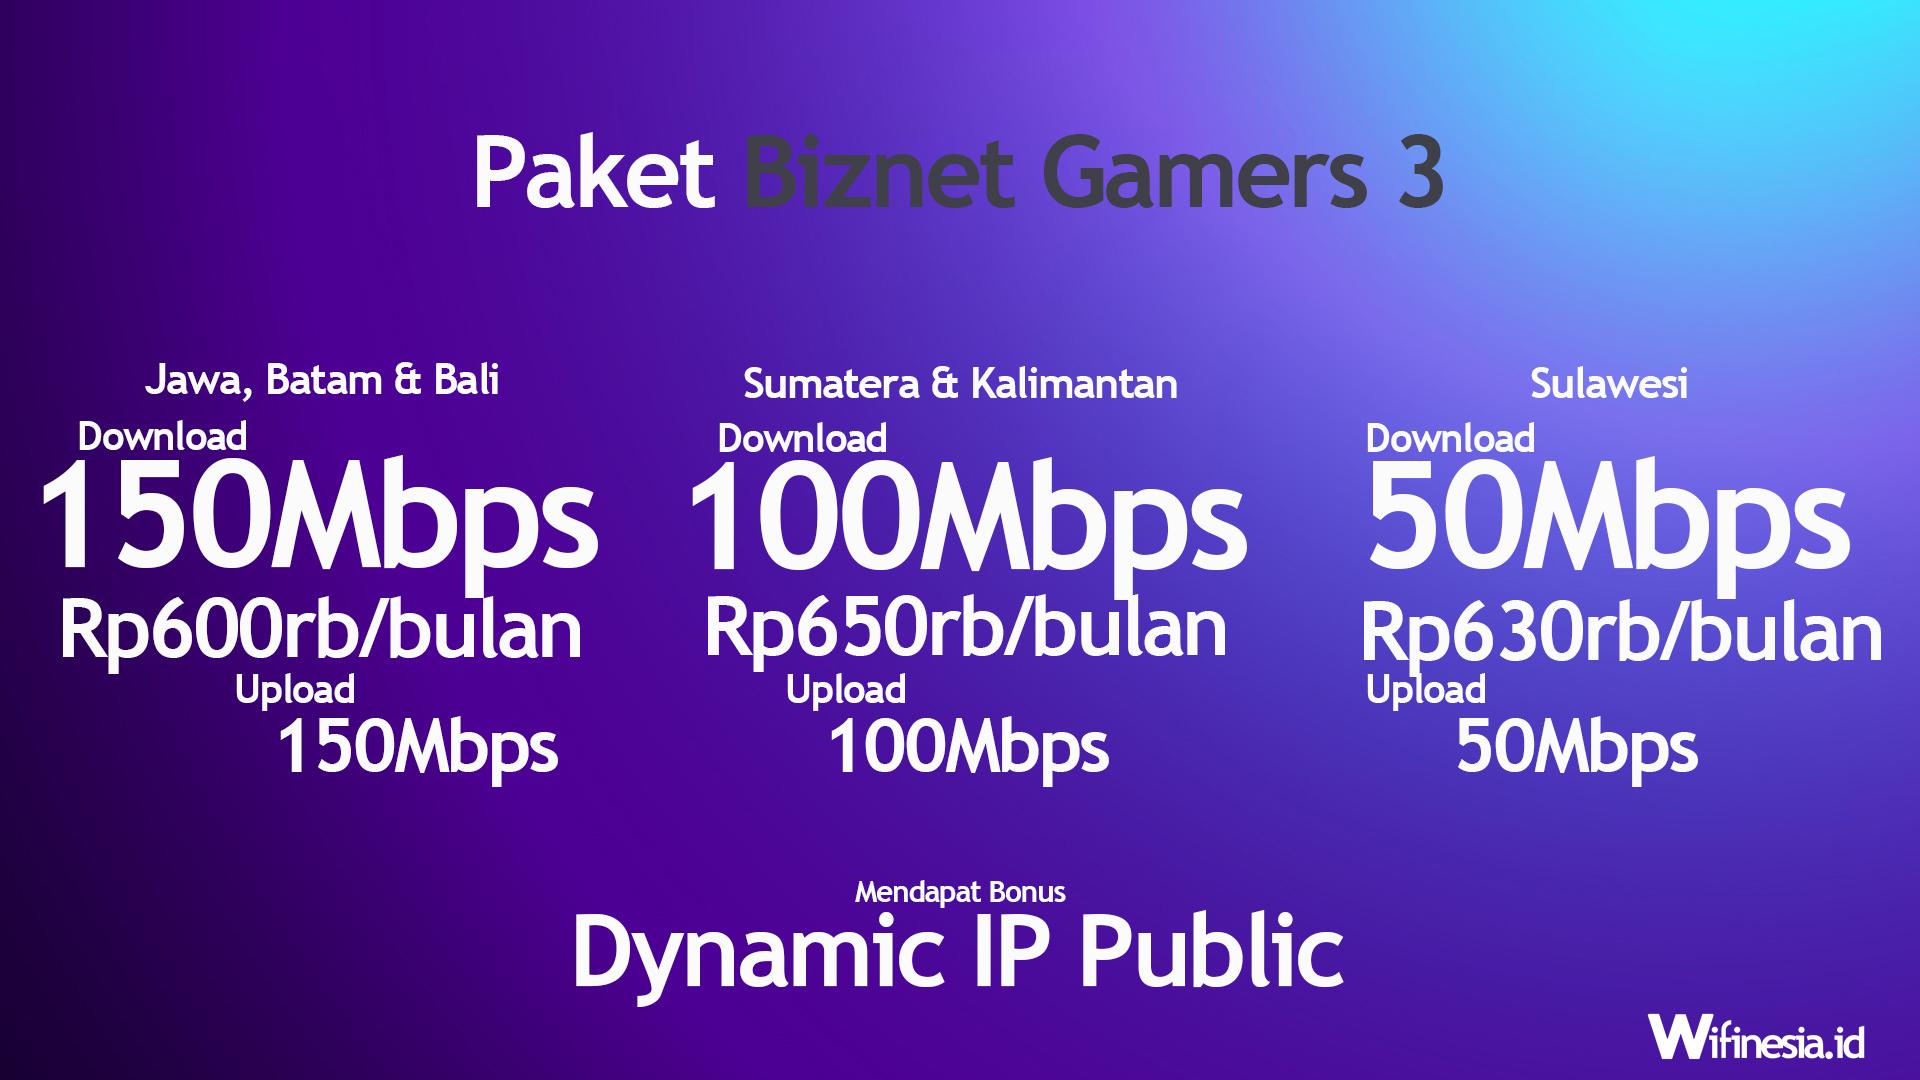 Harga Paket Biznet Gamers 3 WiFi Rumah 2020